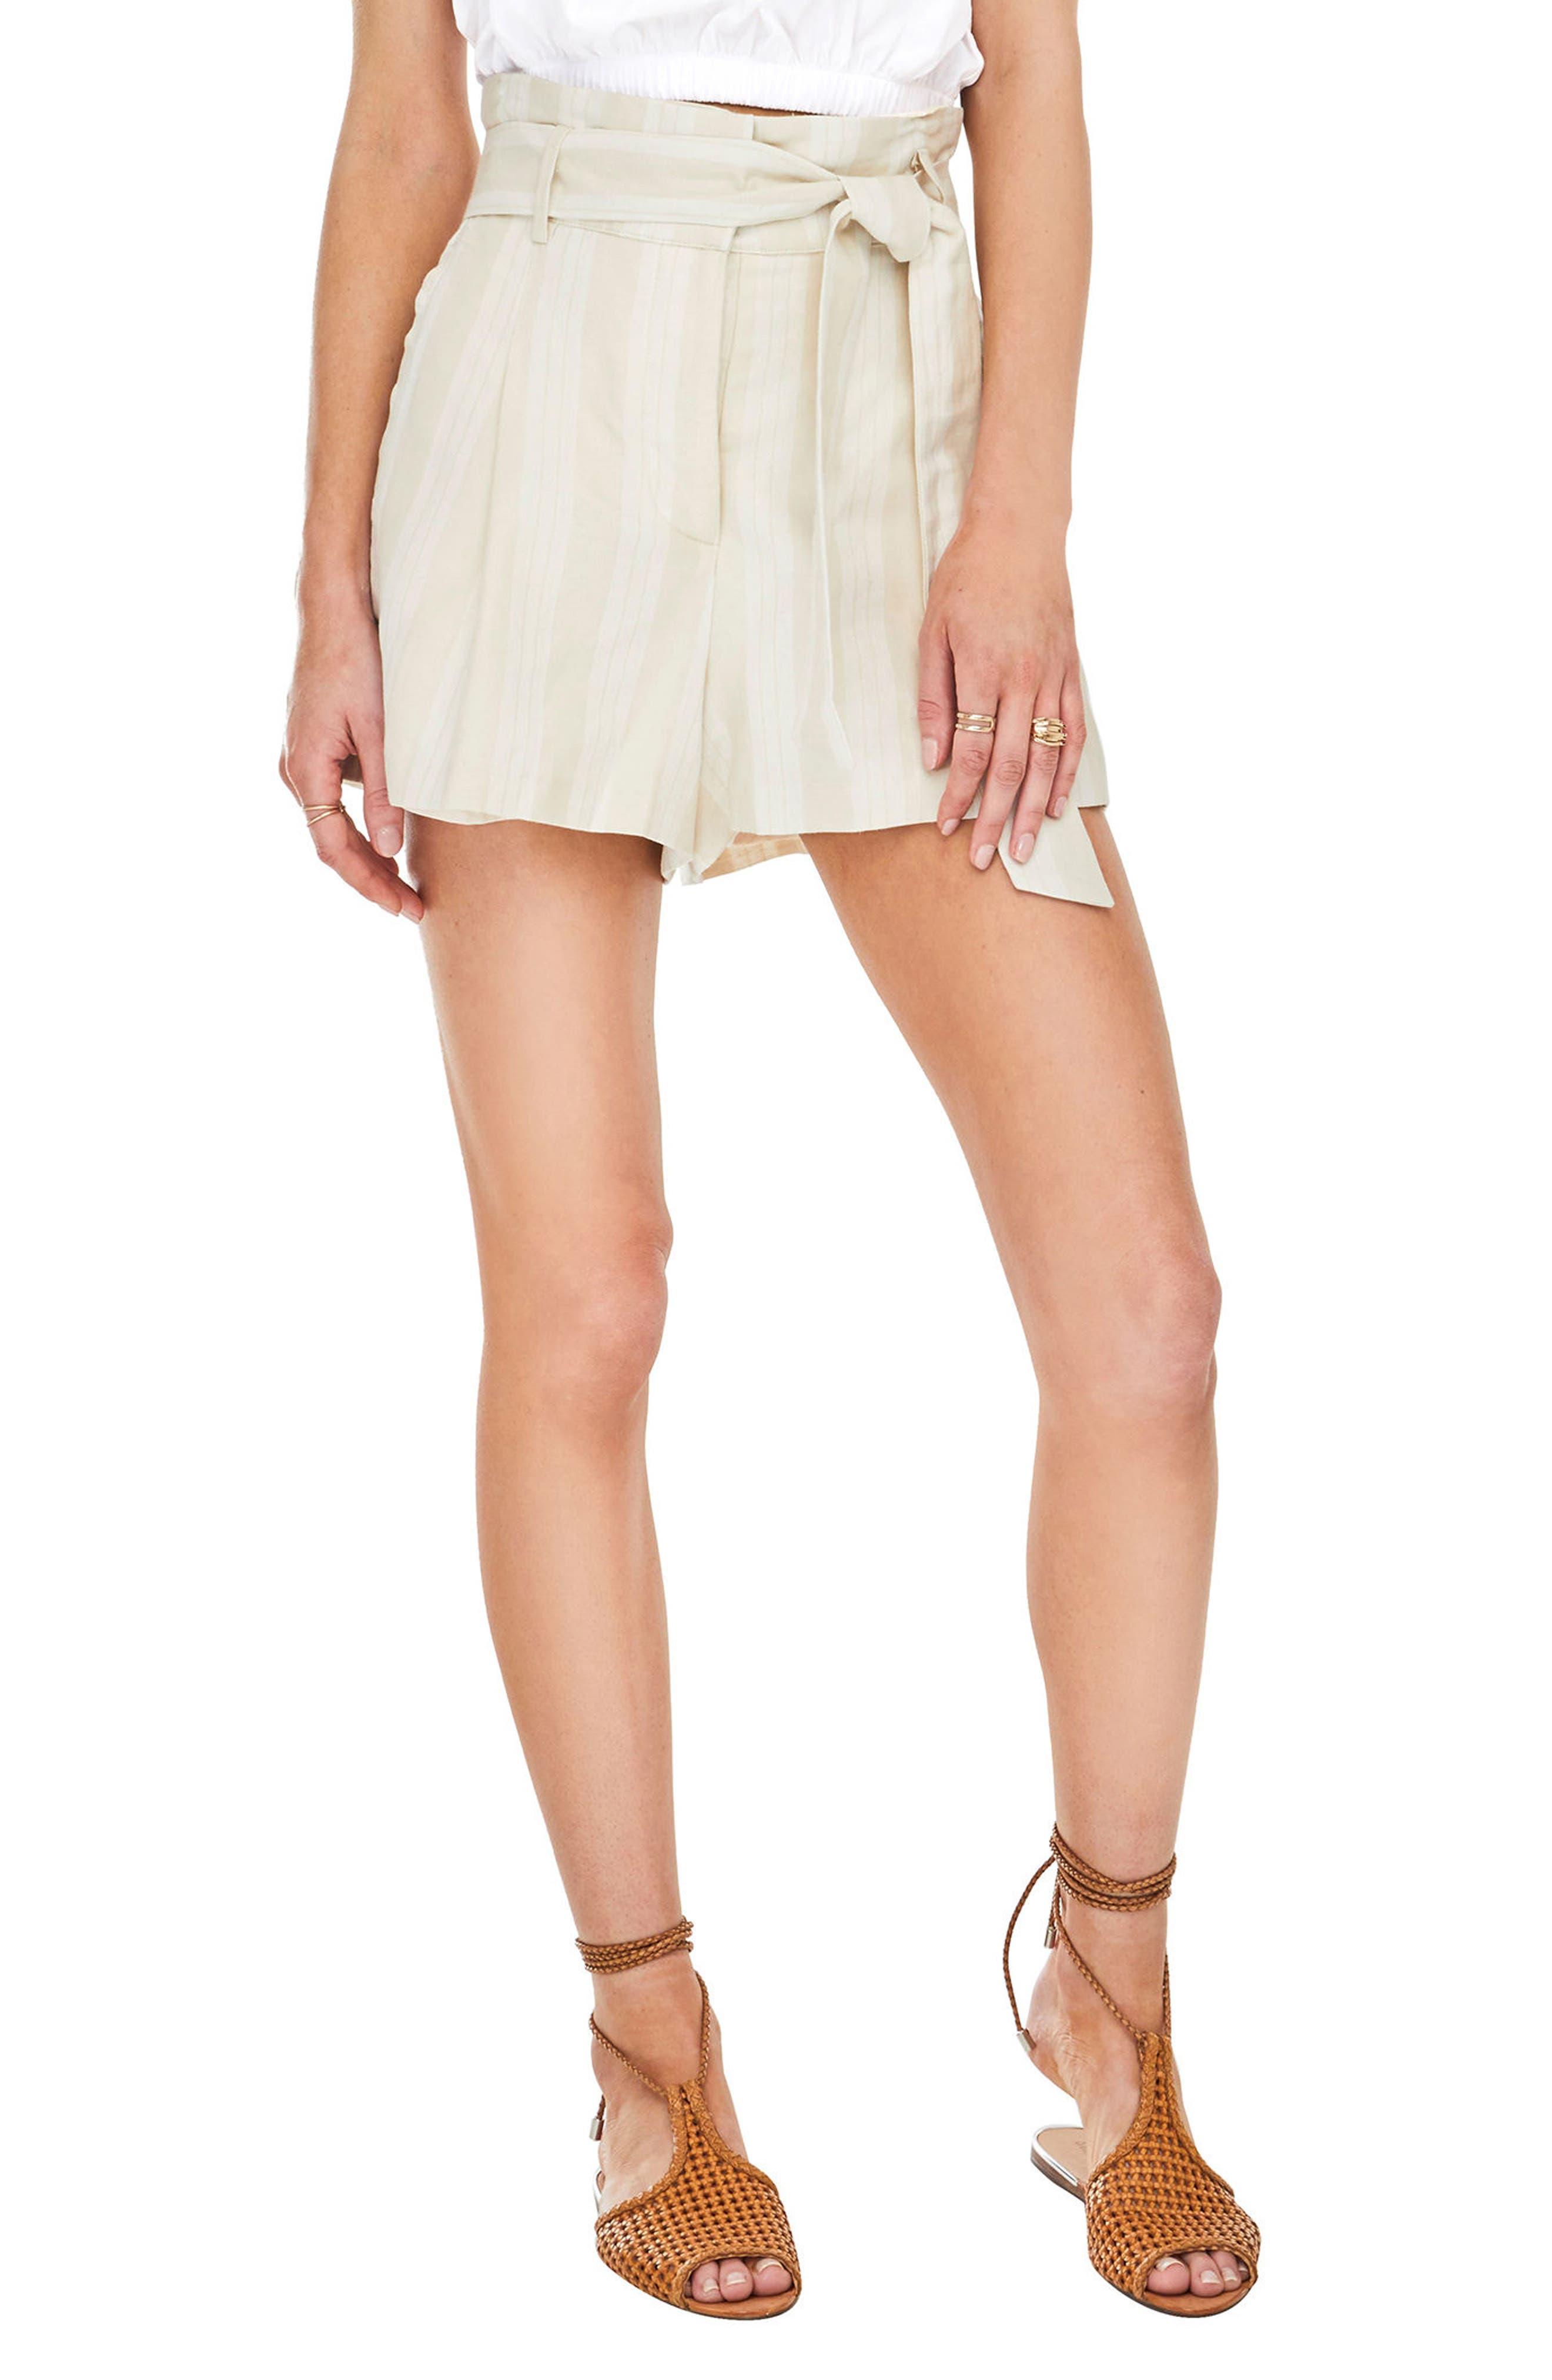 Sullivan Shorts,                         Main,                         color, 250